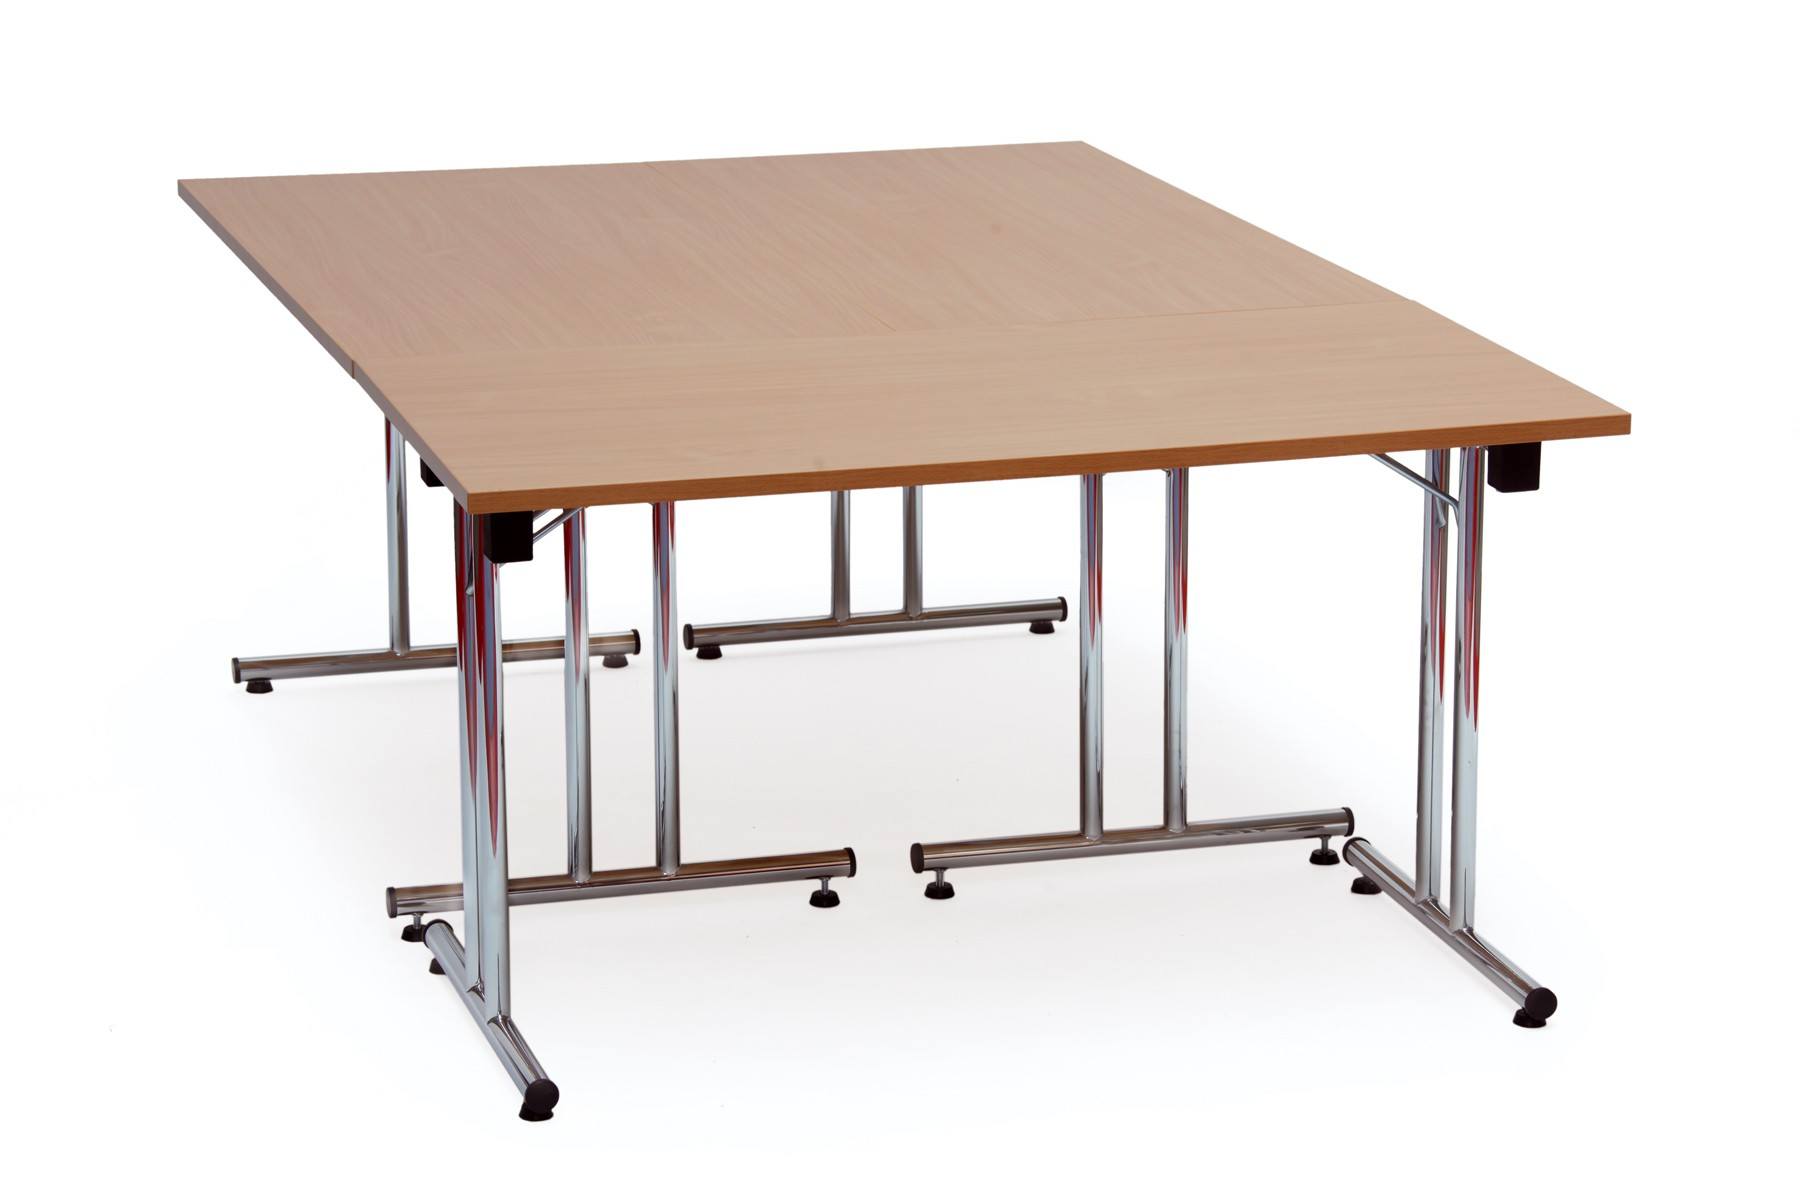 table pliante empilable komino achat tables de r union 159 00. Black Bedroom Furniture Sets. Home Design Ideas